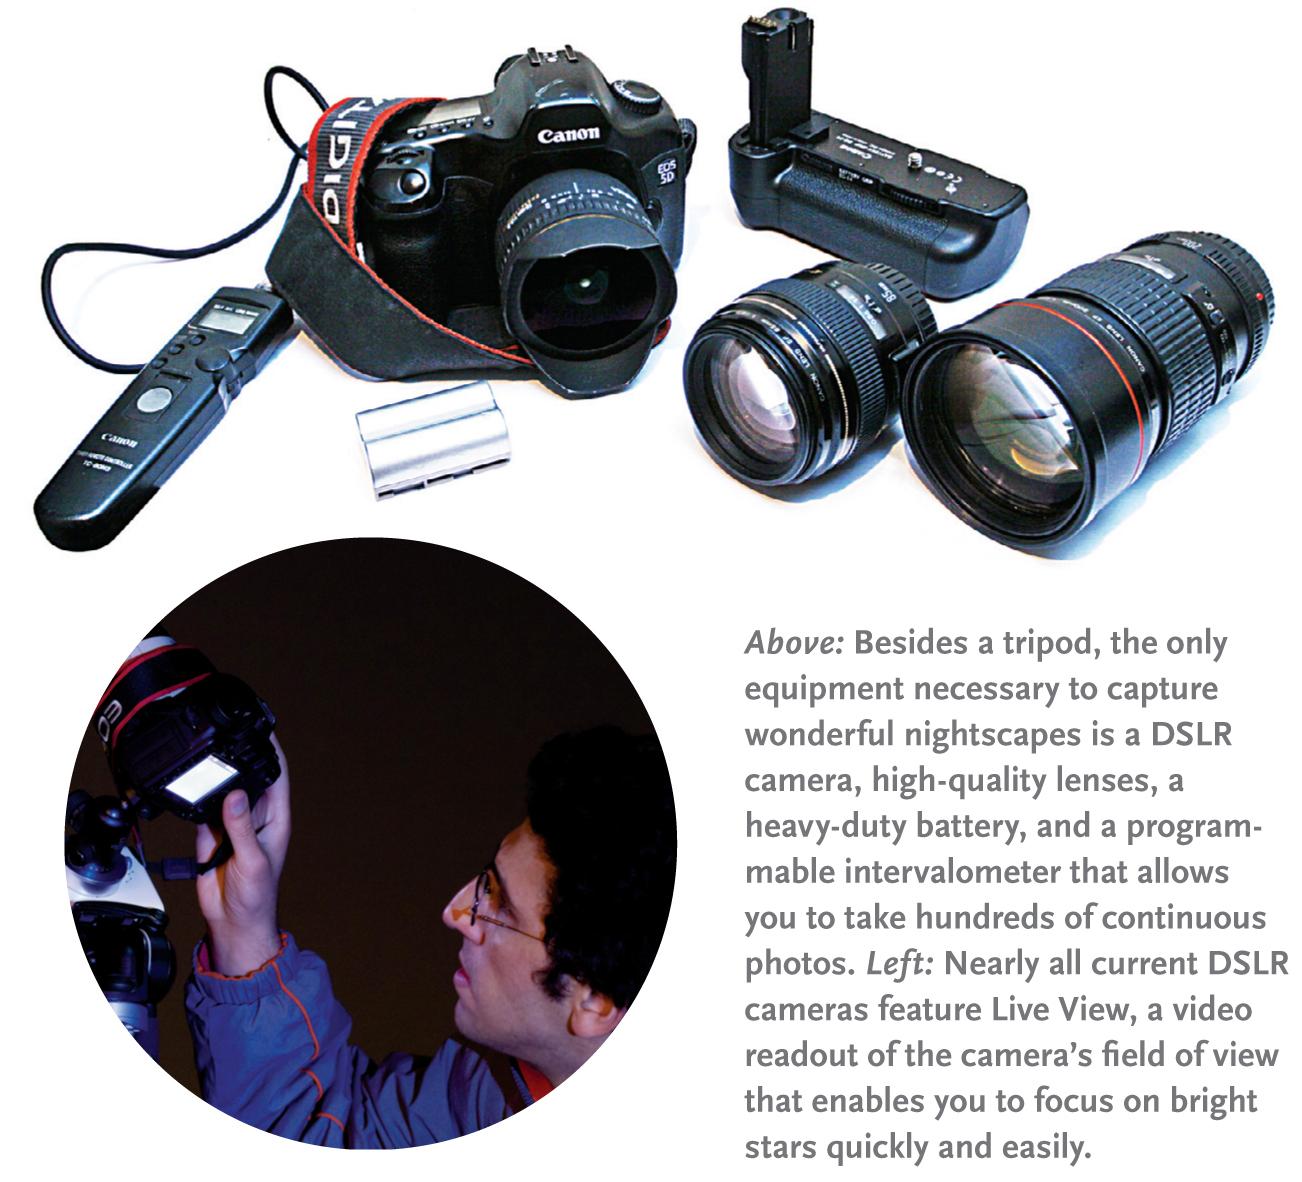 Nightscape equipment